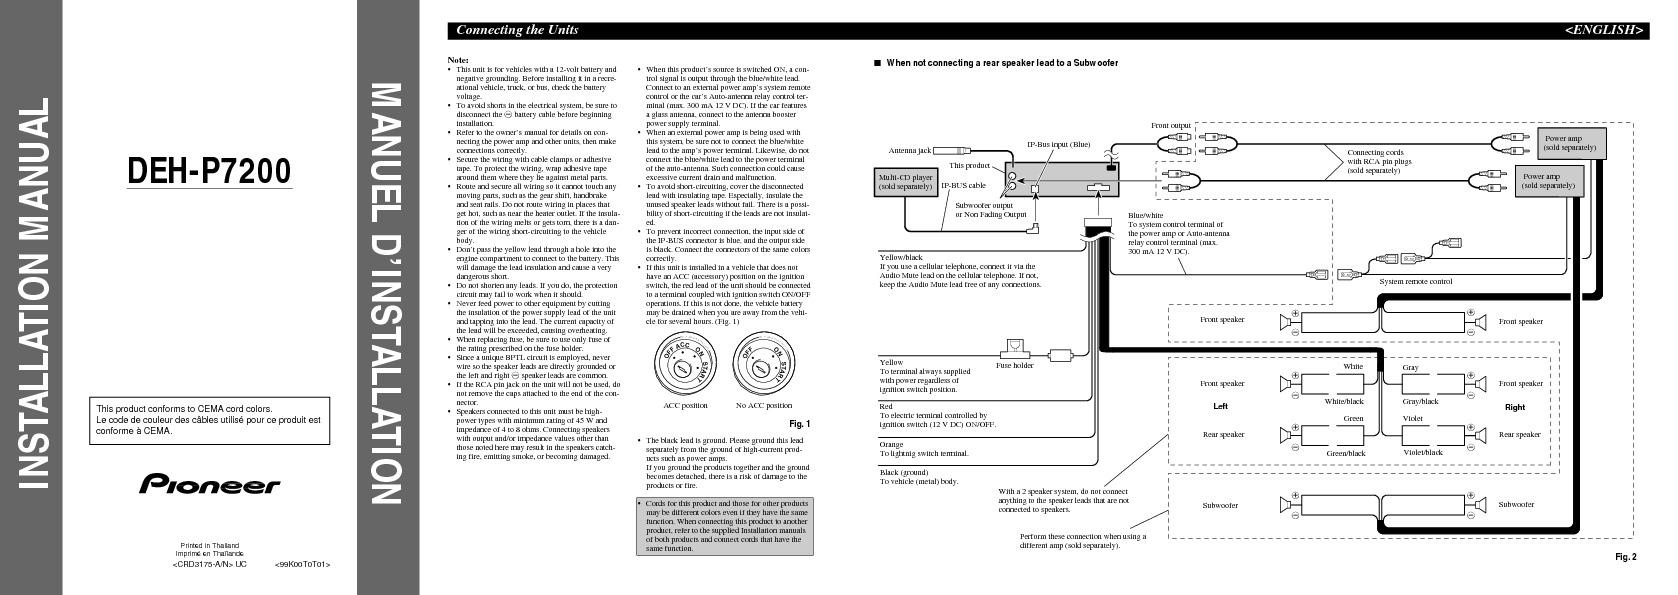 DEH-P7200 Install Manual.pdf PIONEER